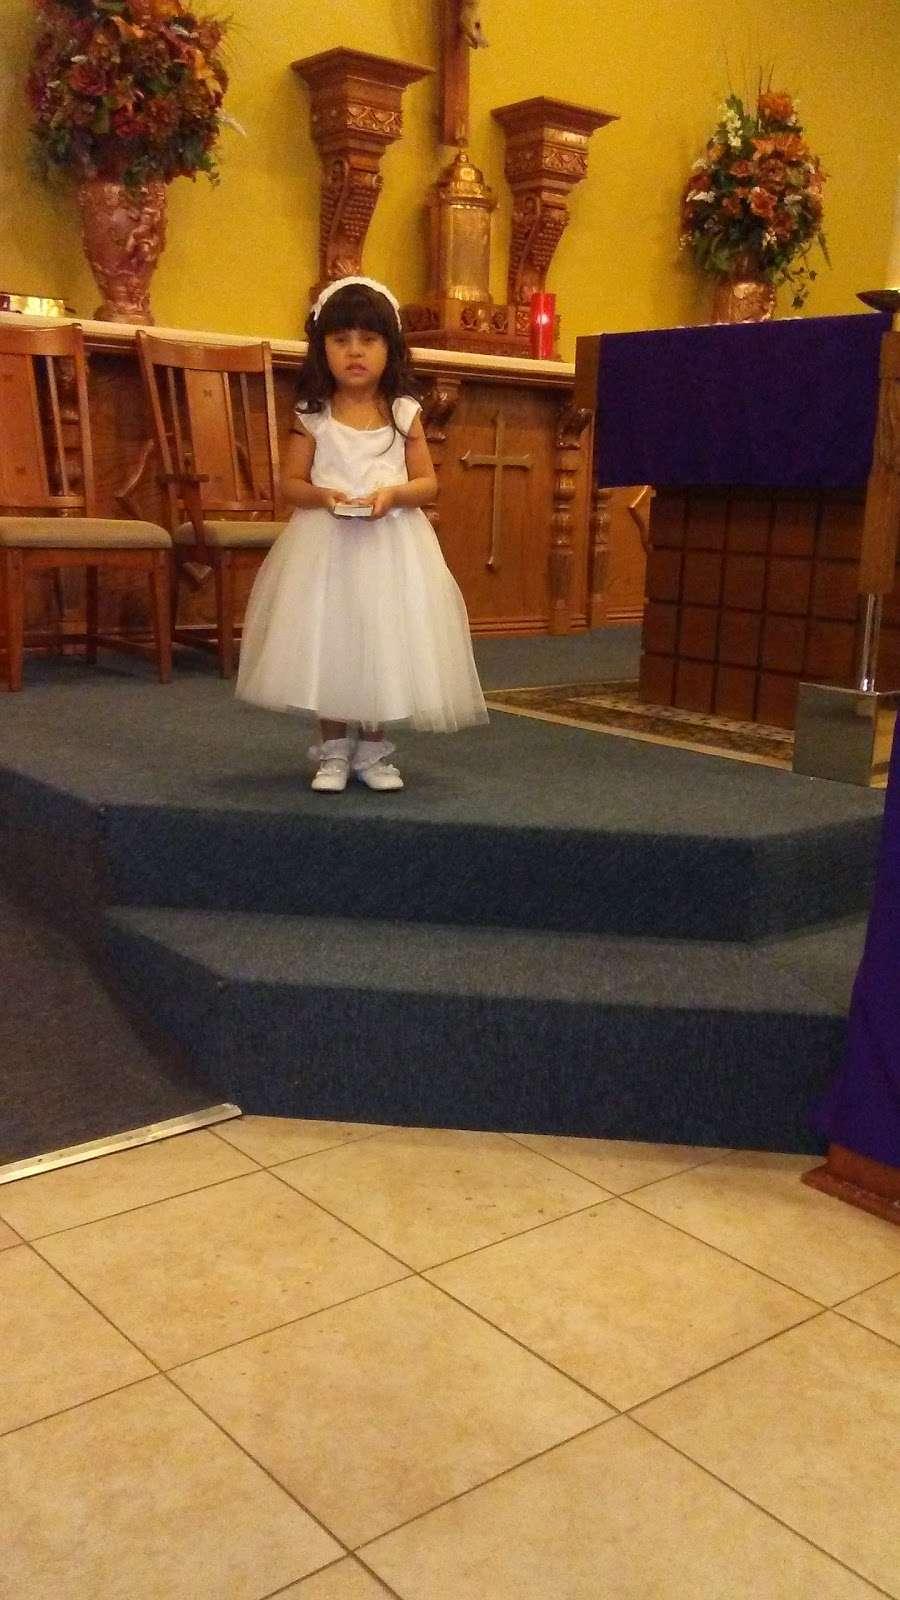 Saint Williams Catholic Church - church    Photo 5 of 9   Address: 11025 W 3rd St, Cashion, AZ 85329, USA   Phone: (623) 936-6115